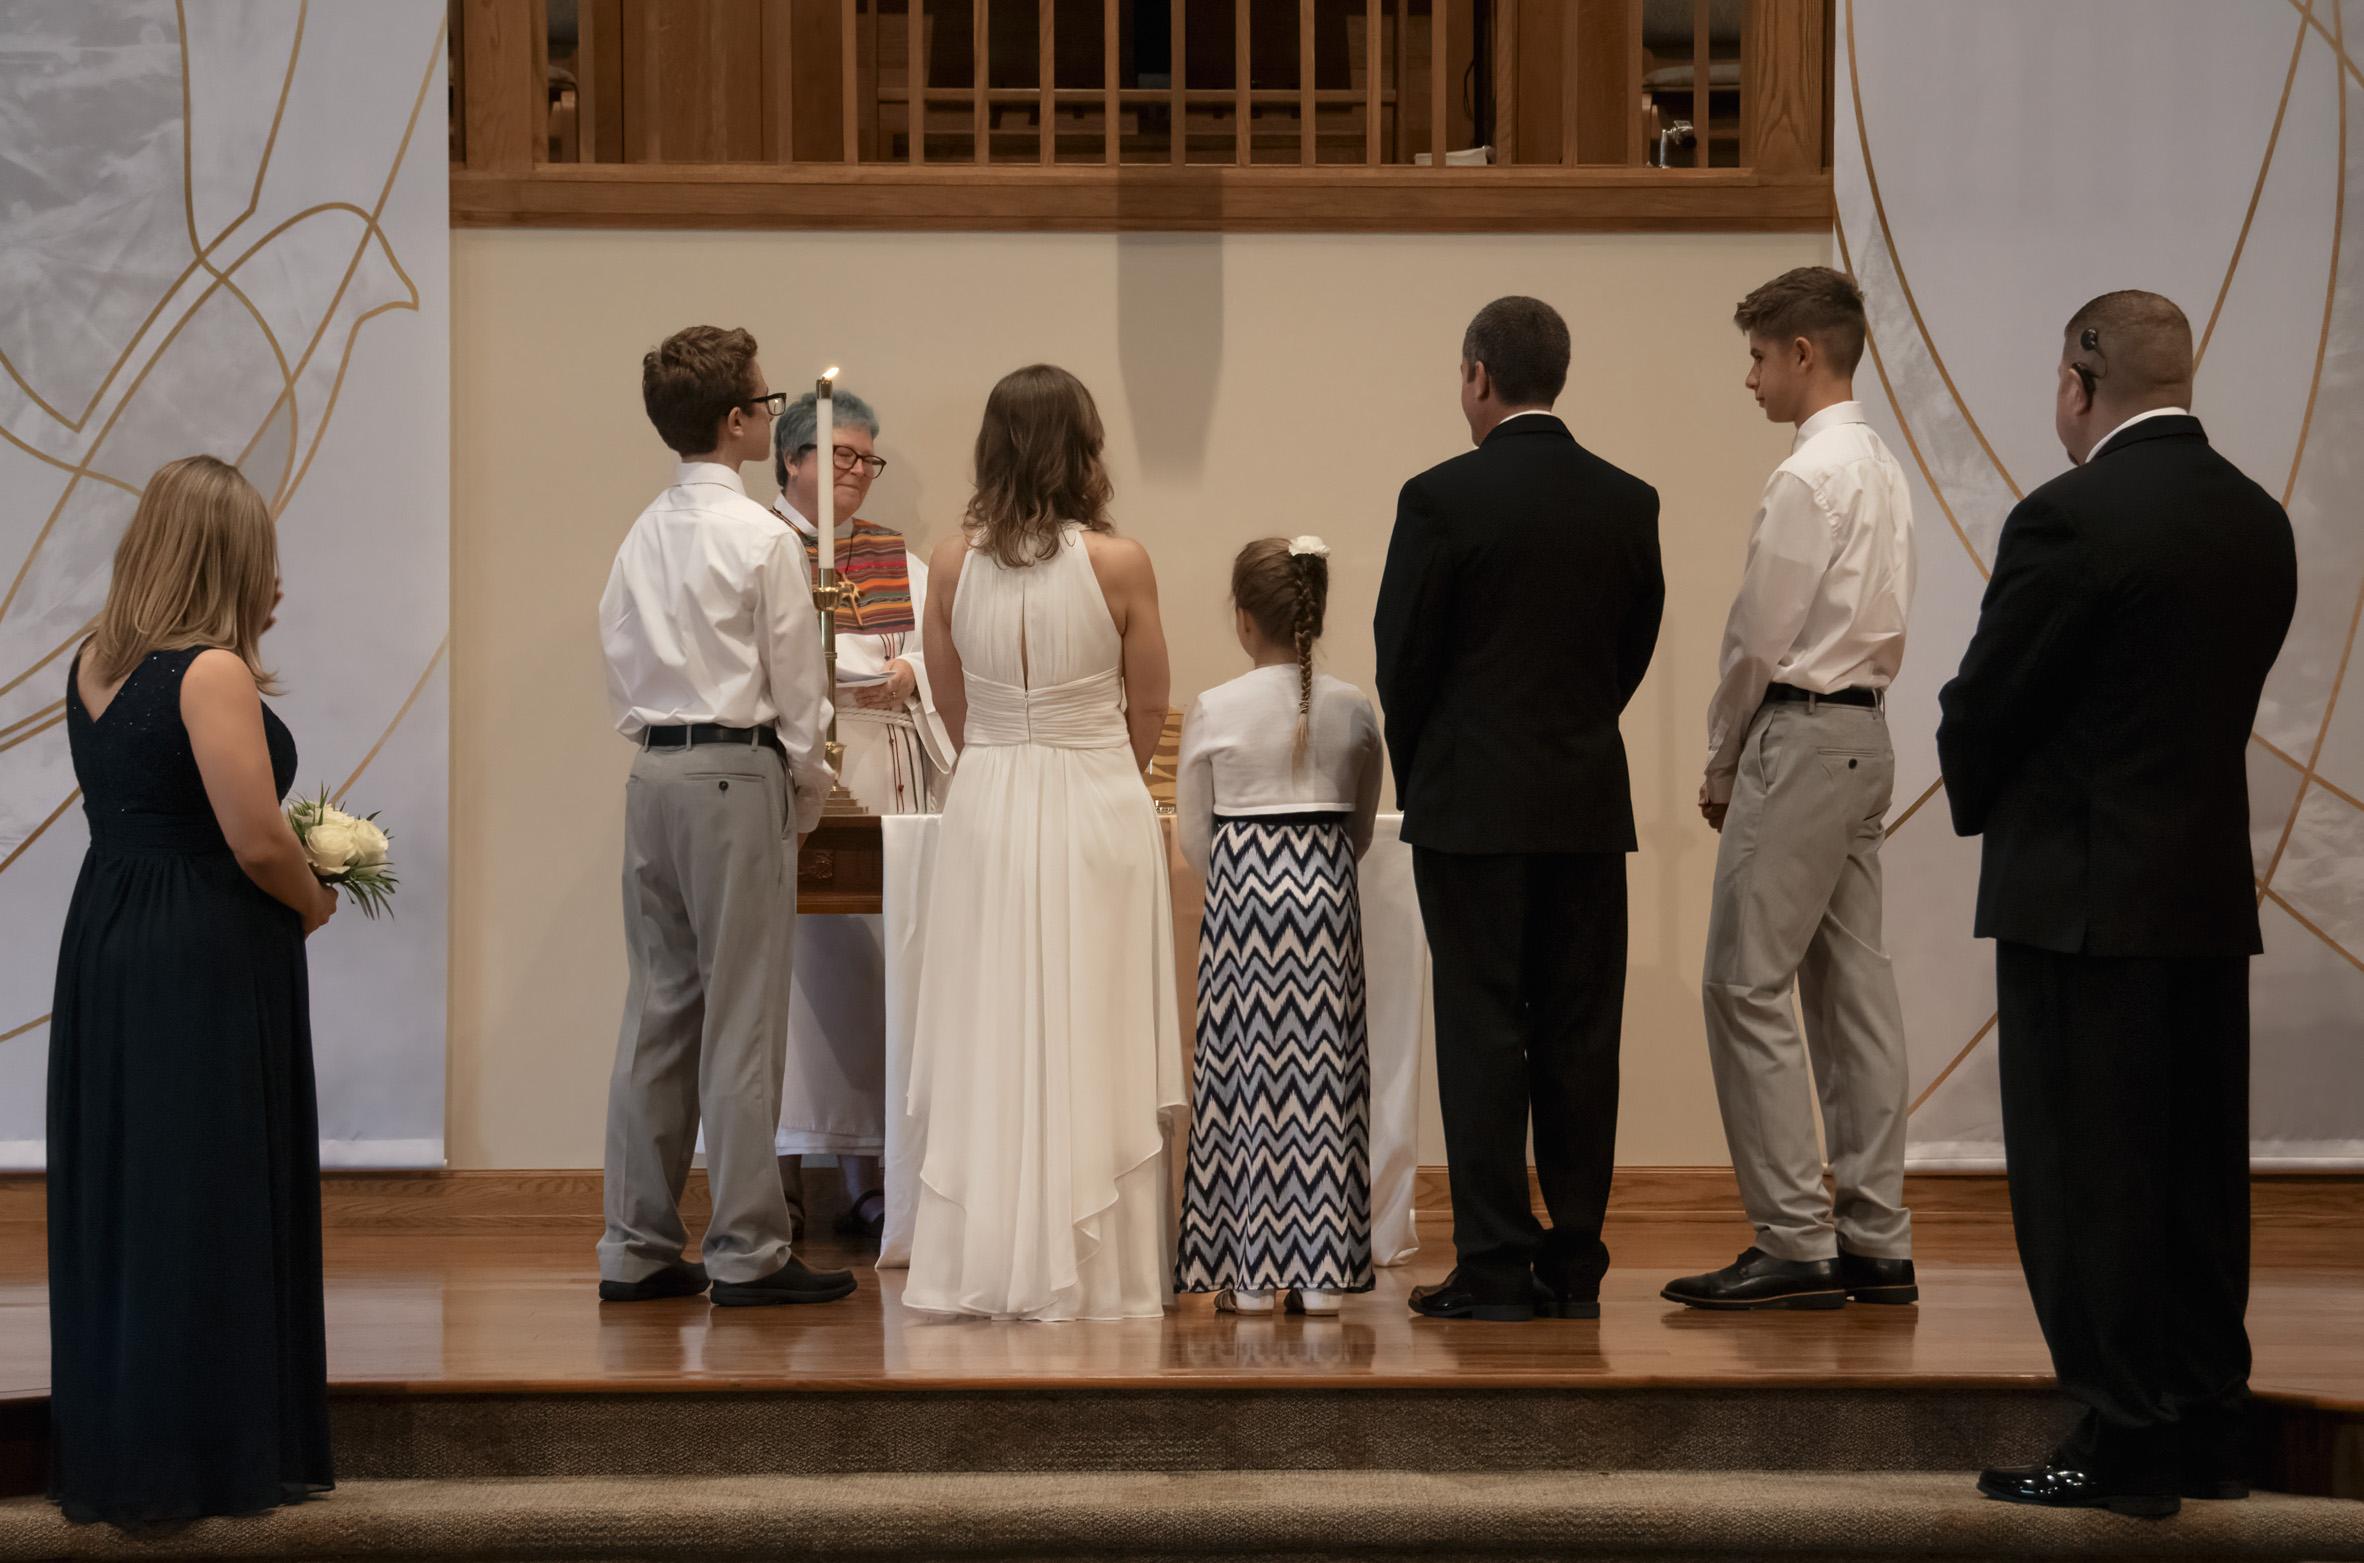 cylekristinwedding (17 of 47).jpg